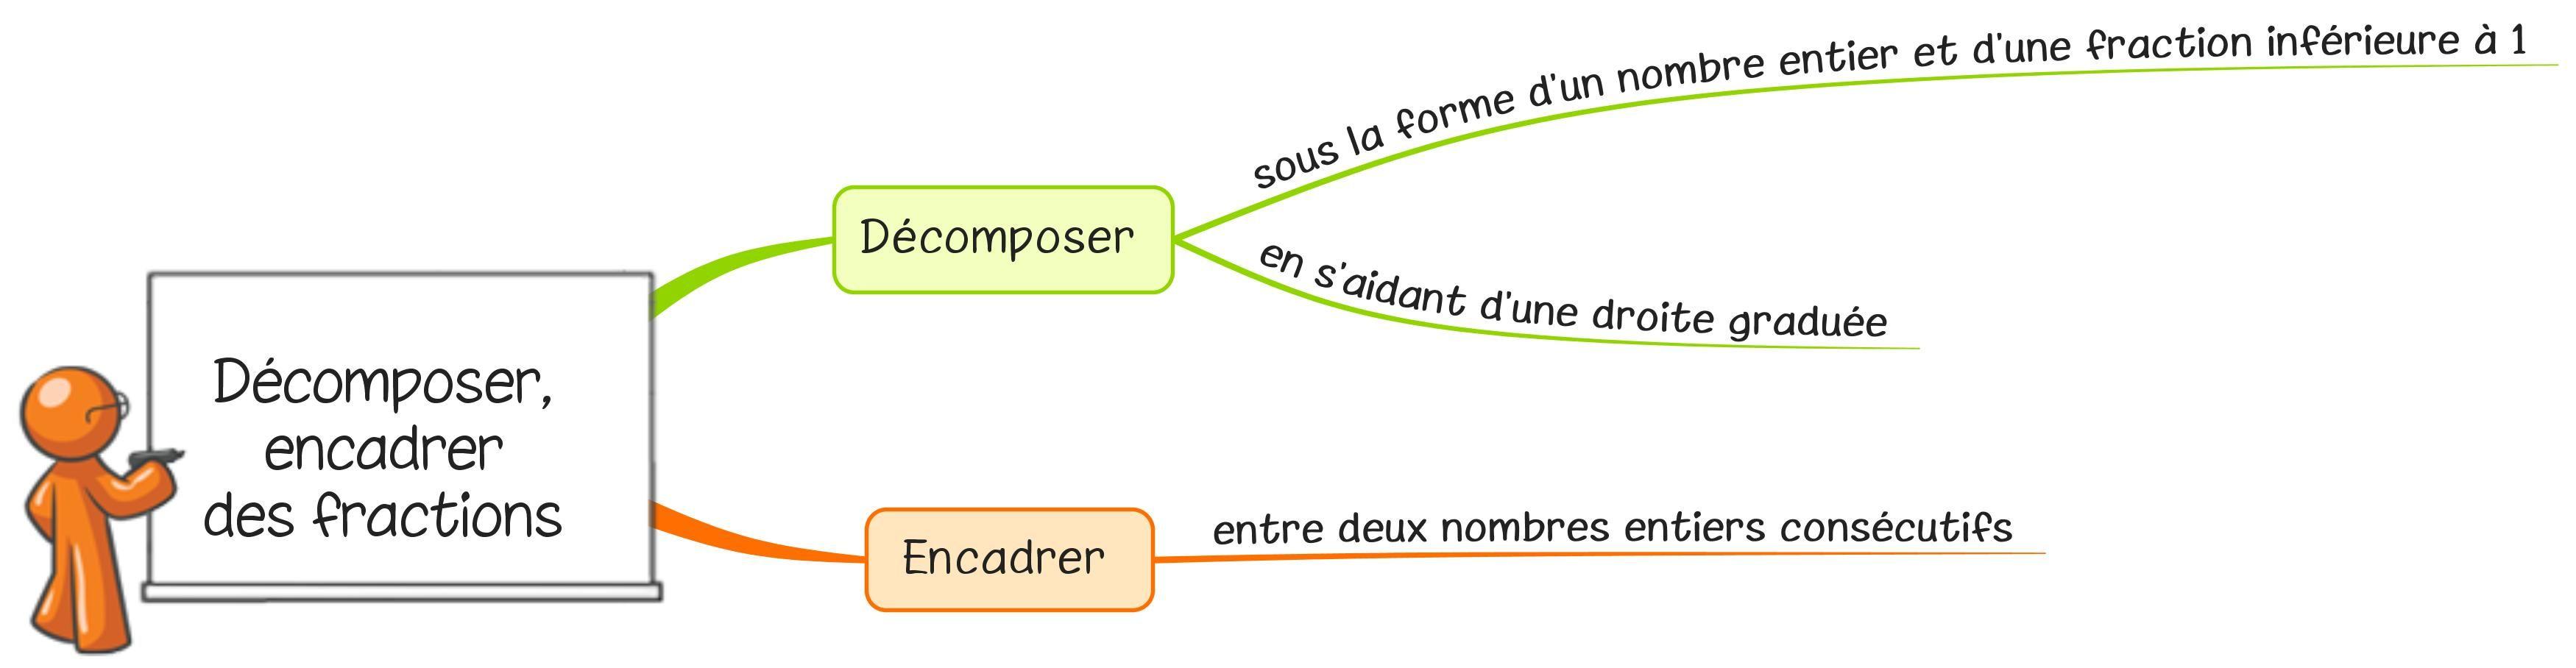 Lecon N9 Decomposer Et Encadrer Des Fractions